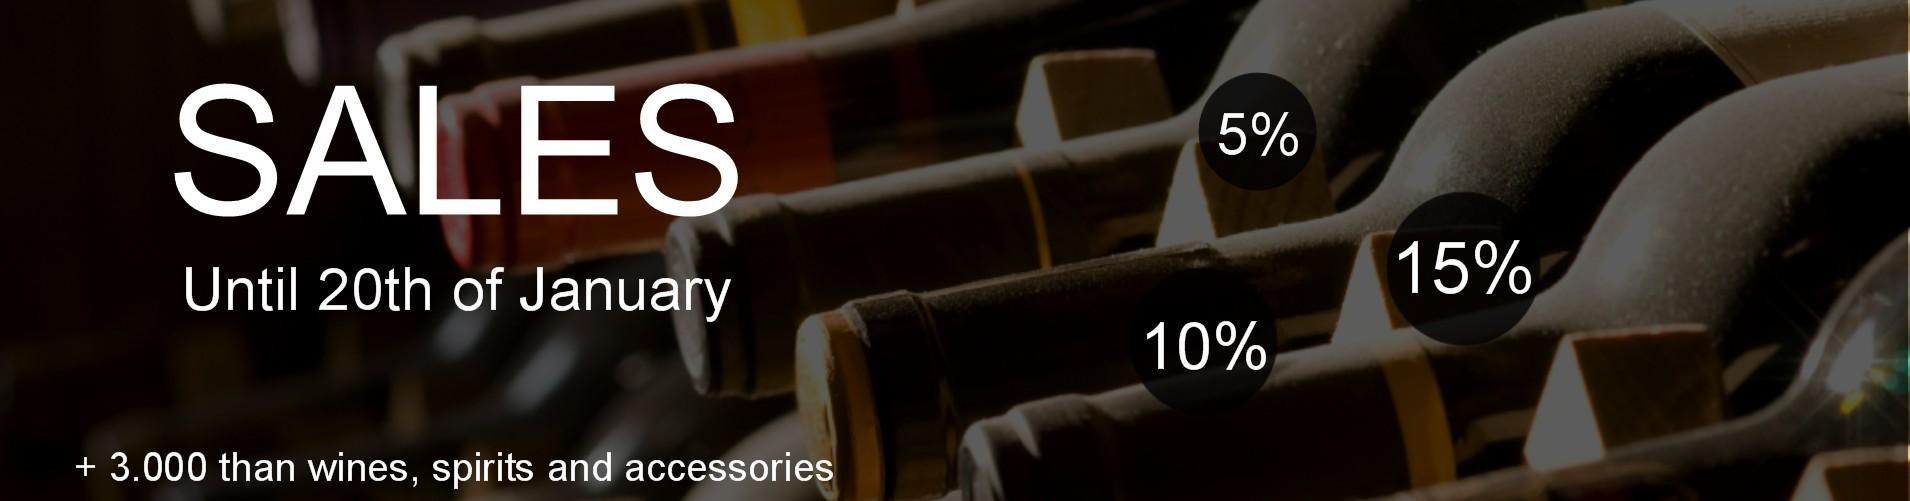 Sales - More than 3.000 wines - mundovinum.co.uk